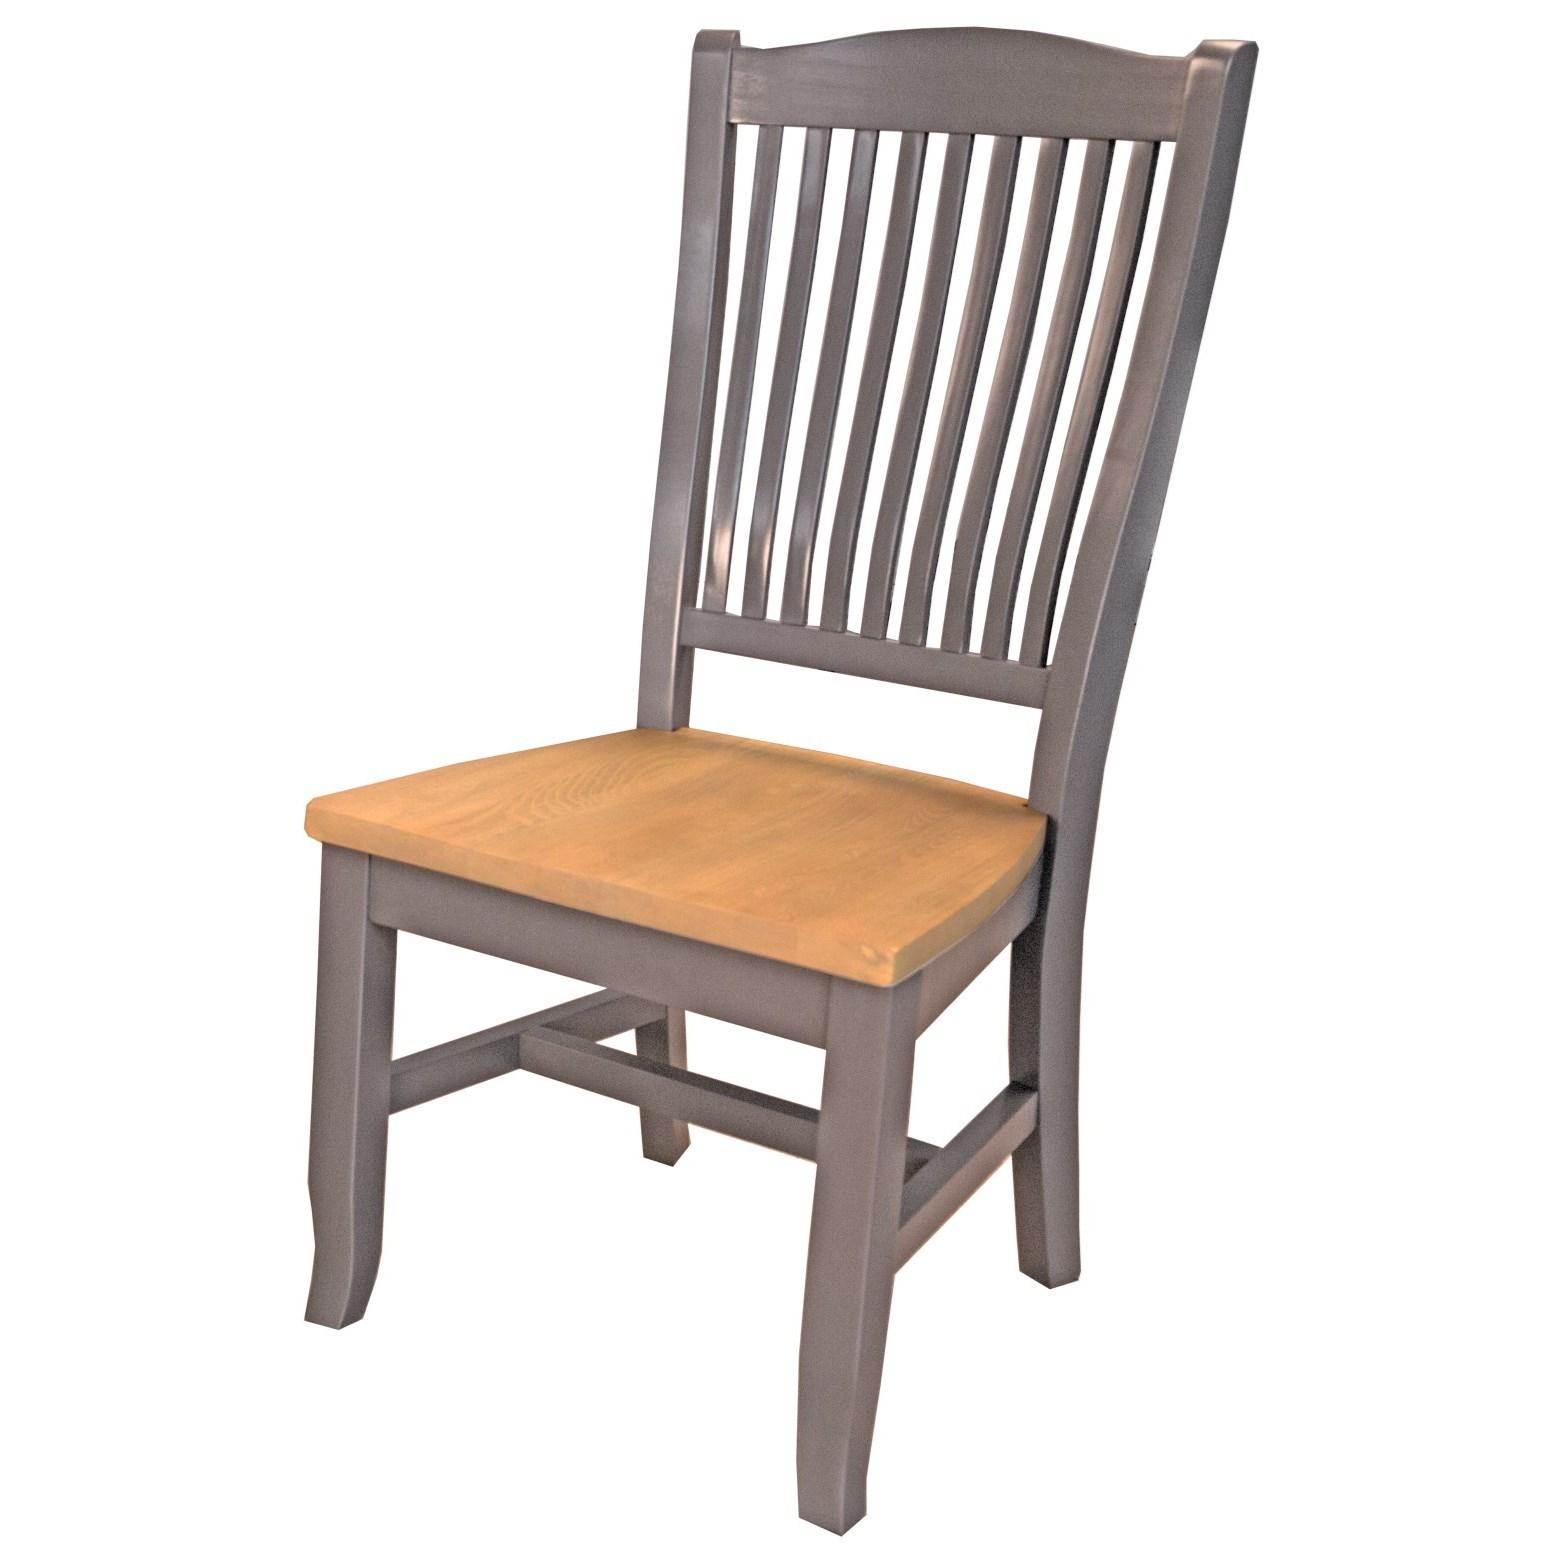 Port Townsend Slatback Side Chair by AAmerica at Dinette Depot